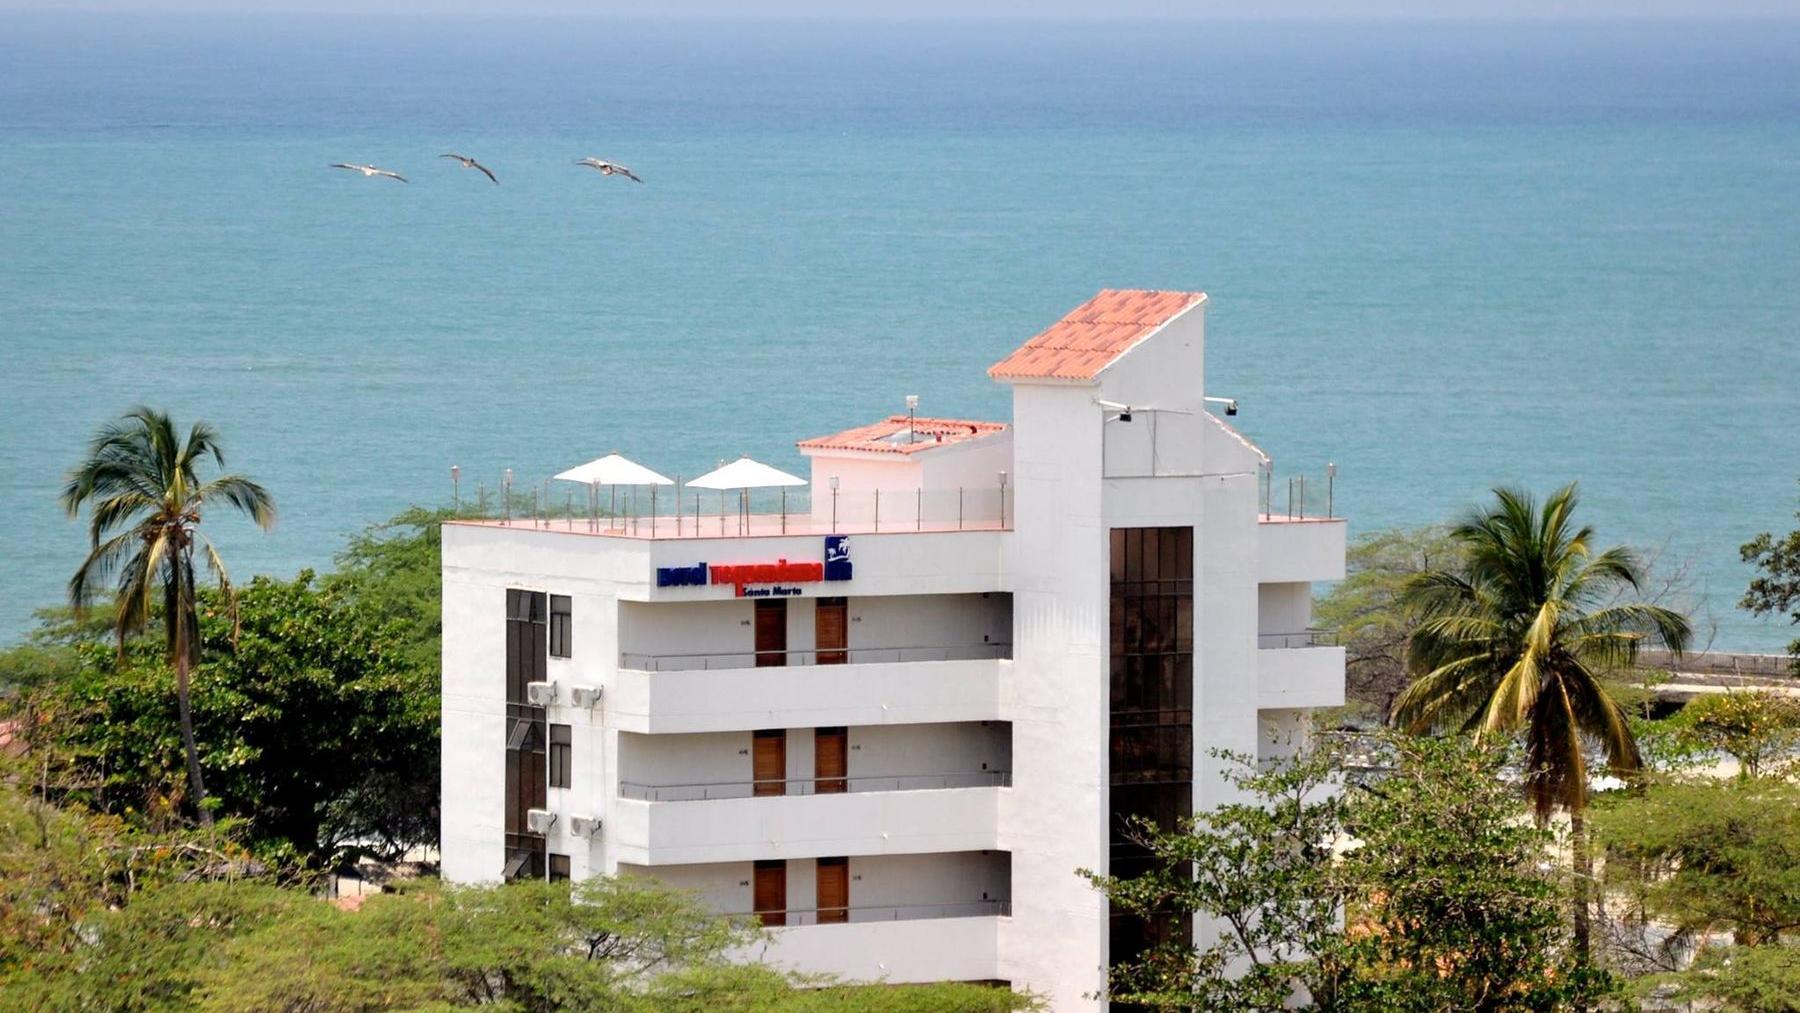 GIO Santa Marta Hotel